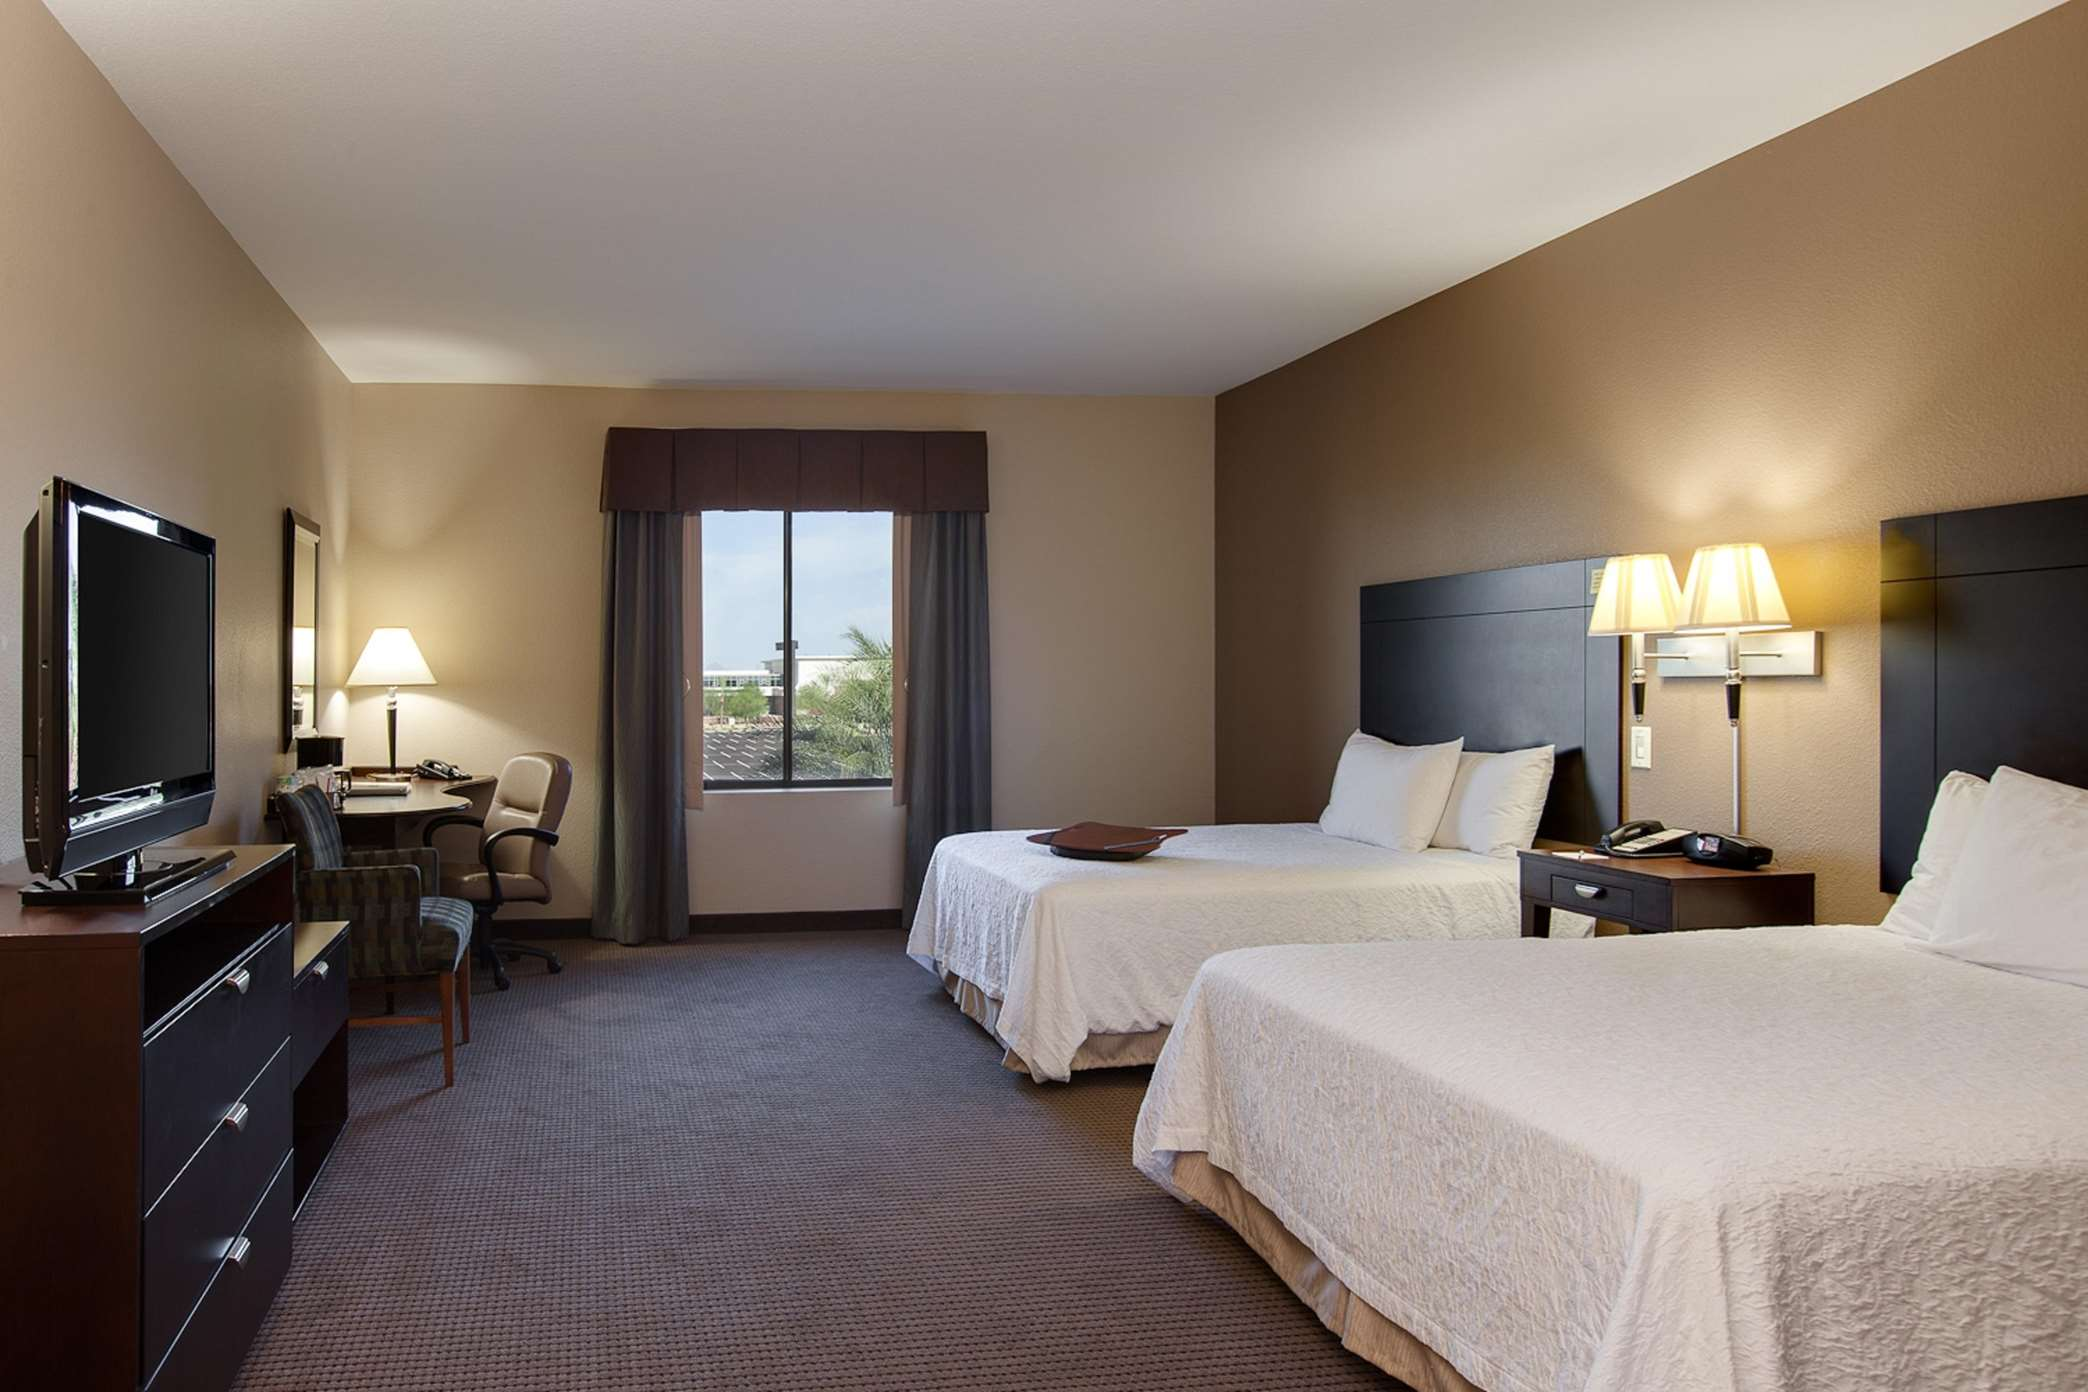 Hampton Inn & Suites Phoenix Glendale-Westgate image 24